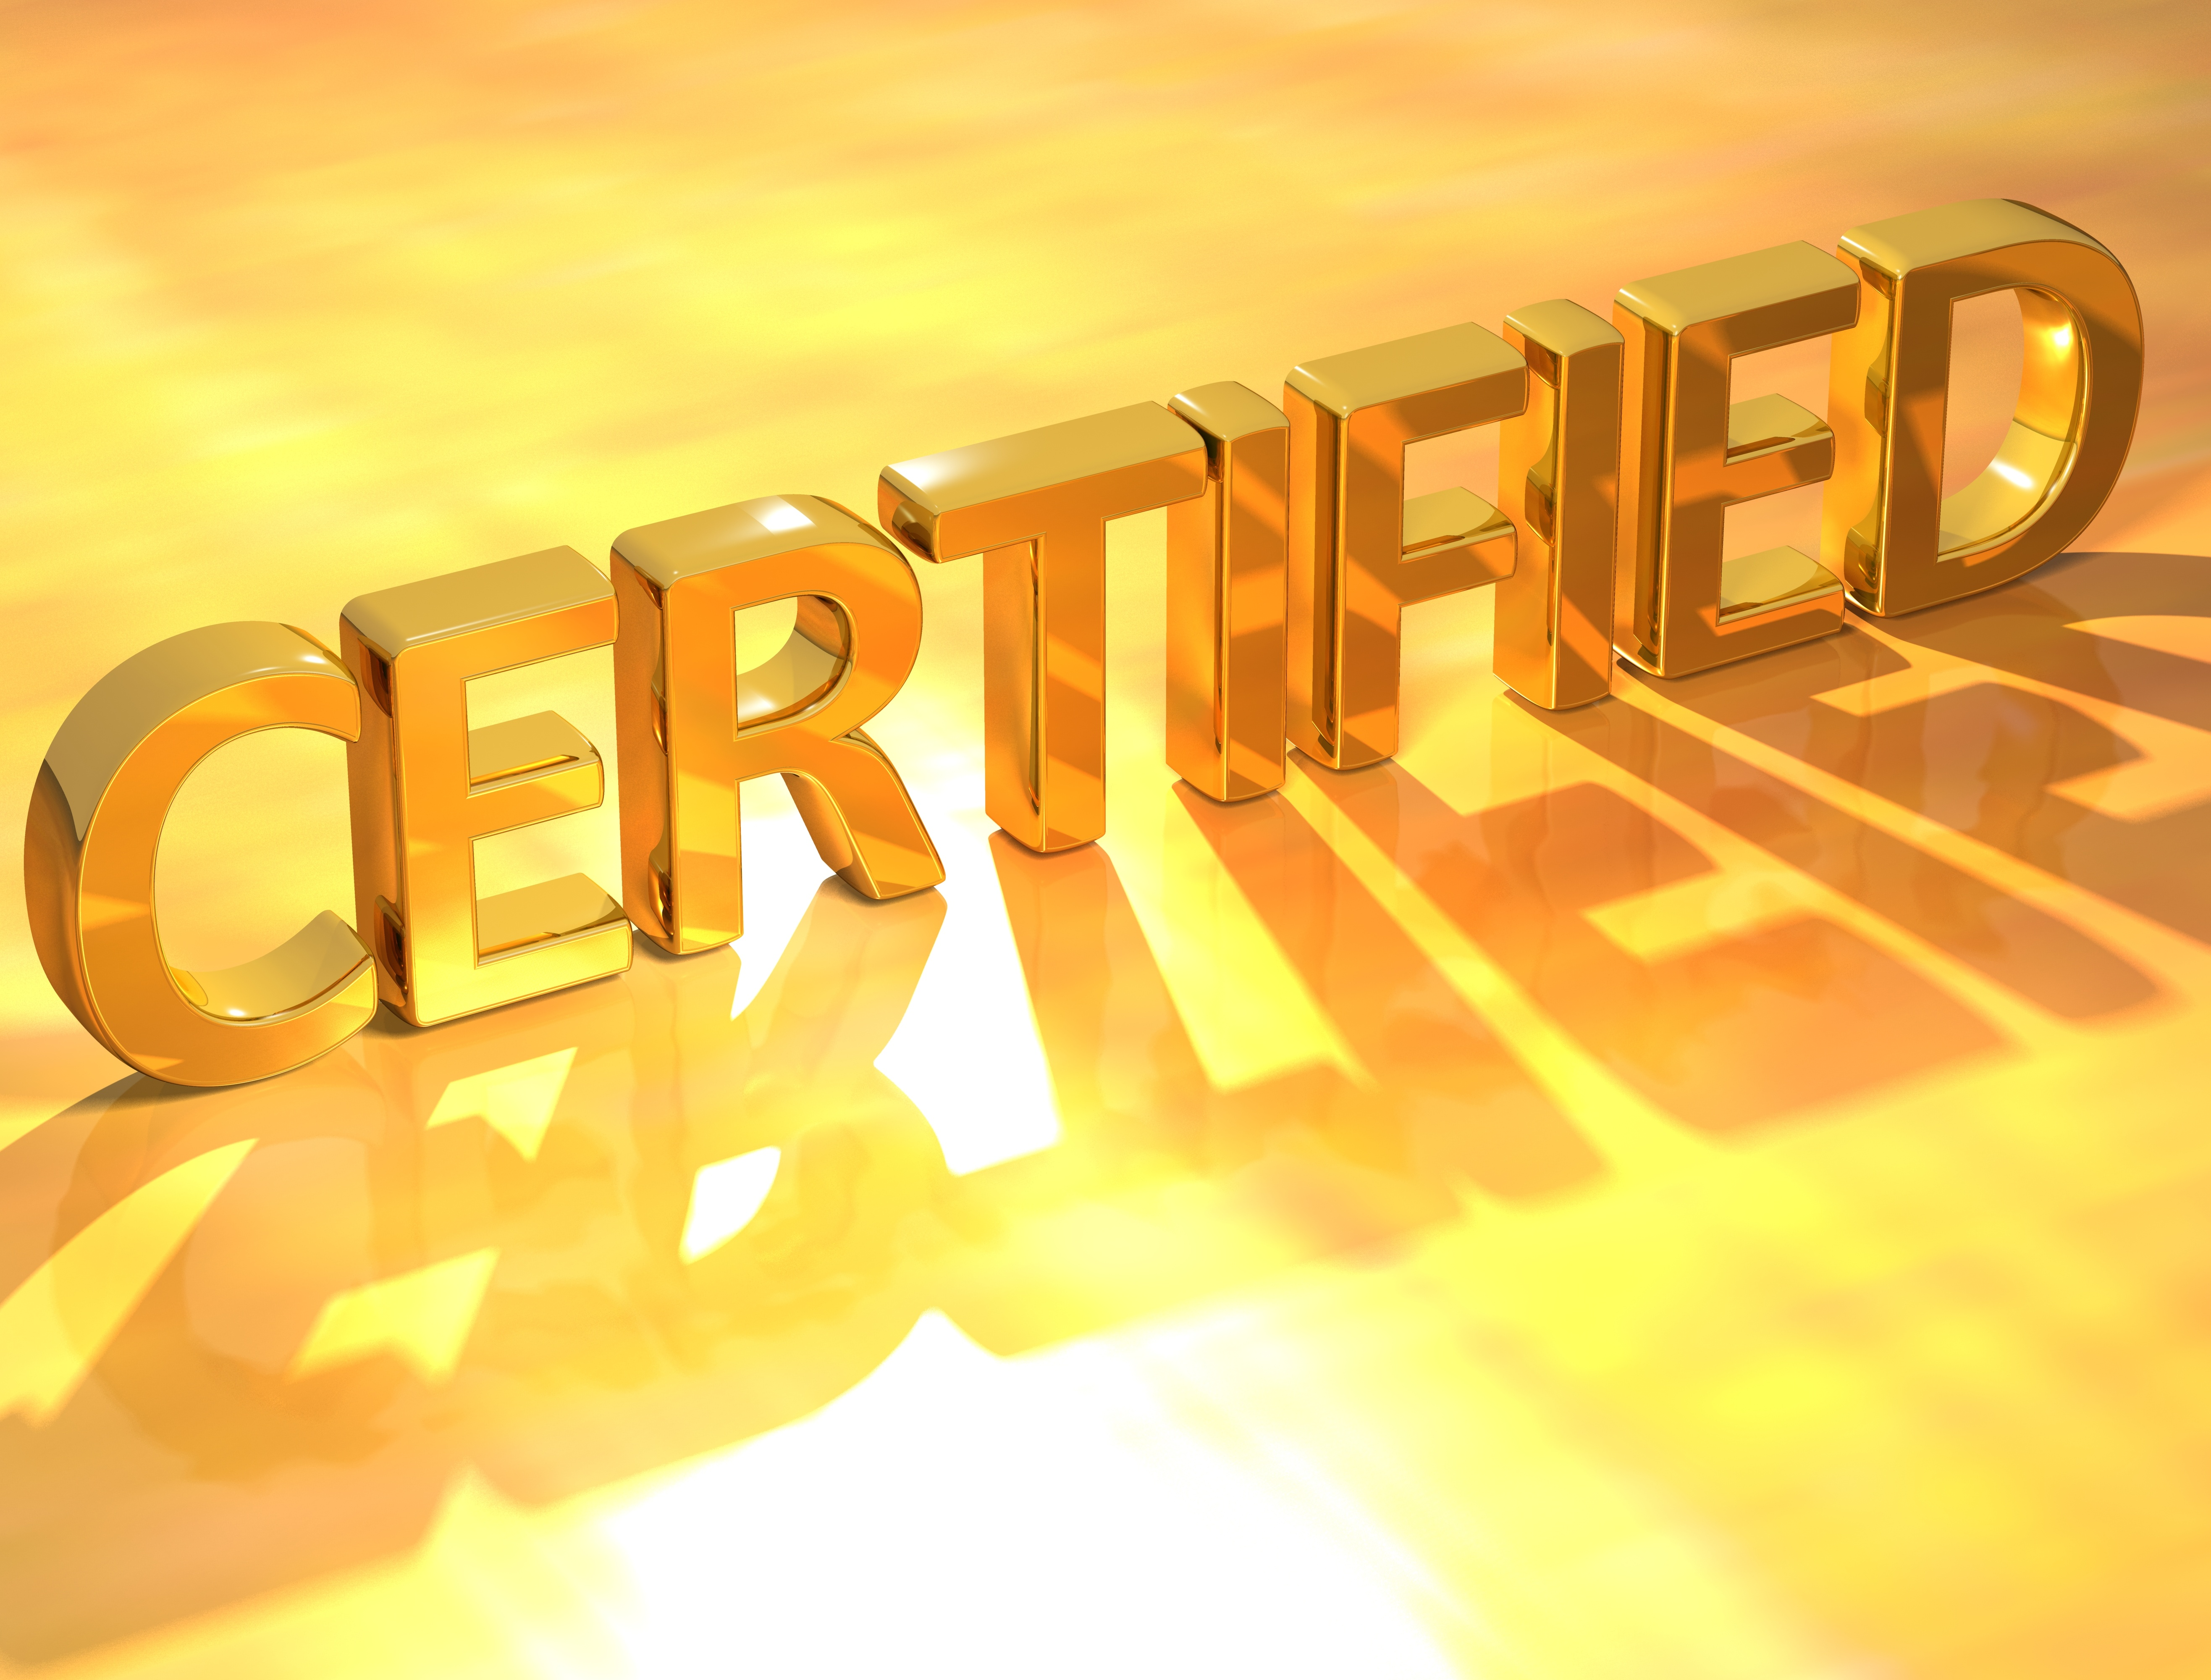 iStock-682718504 Certified - QSCD